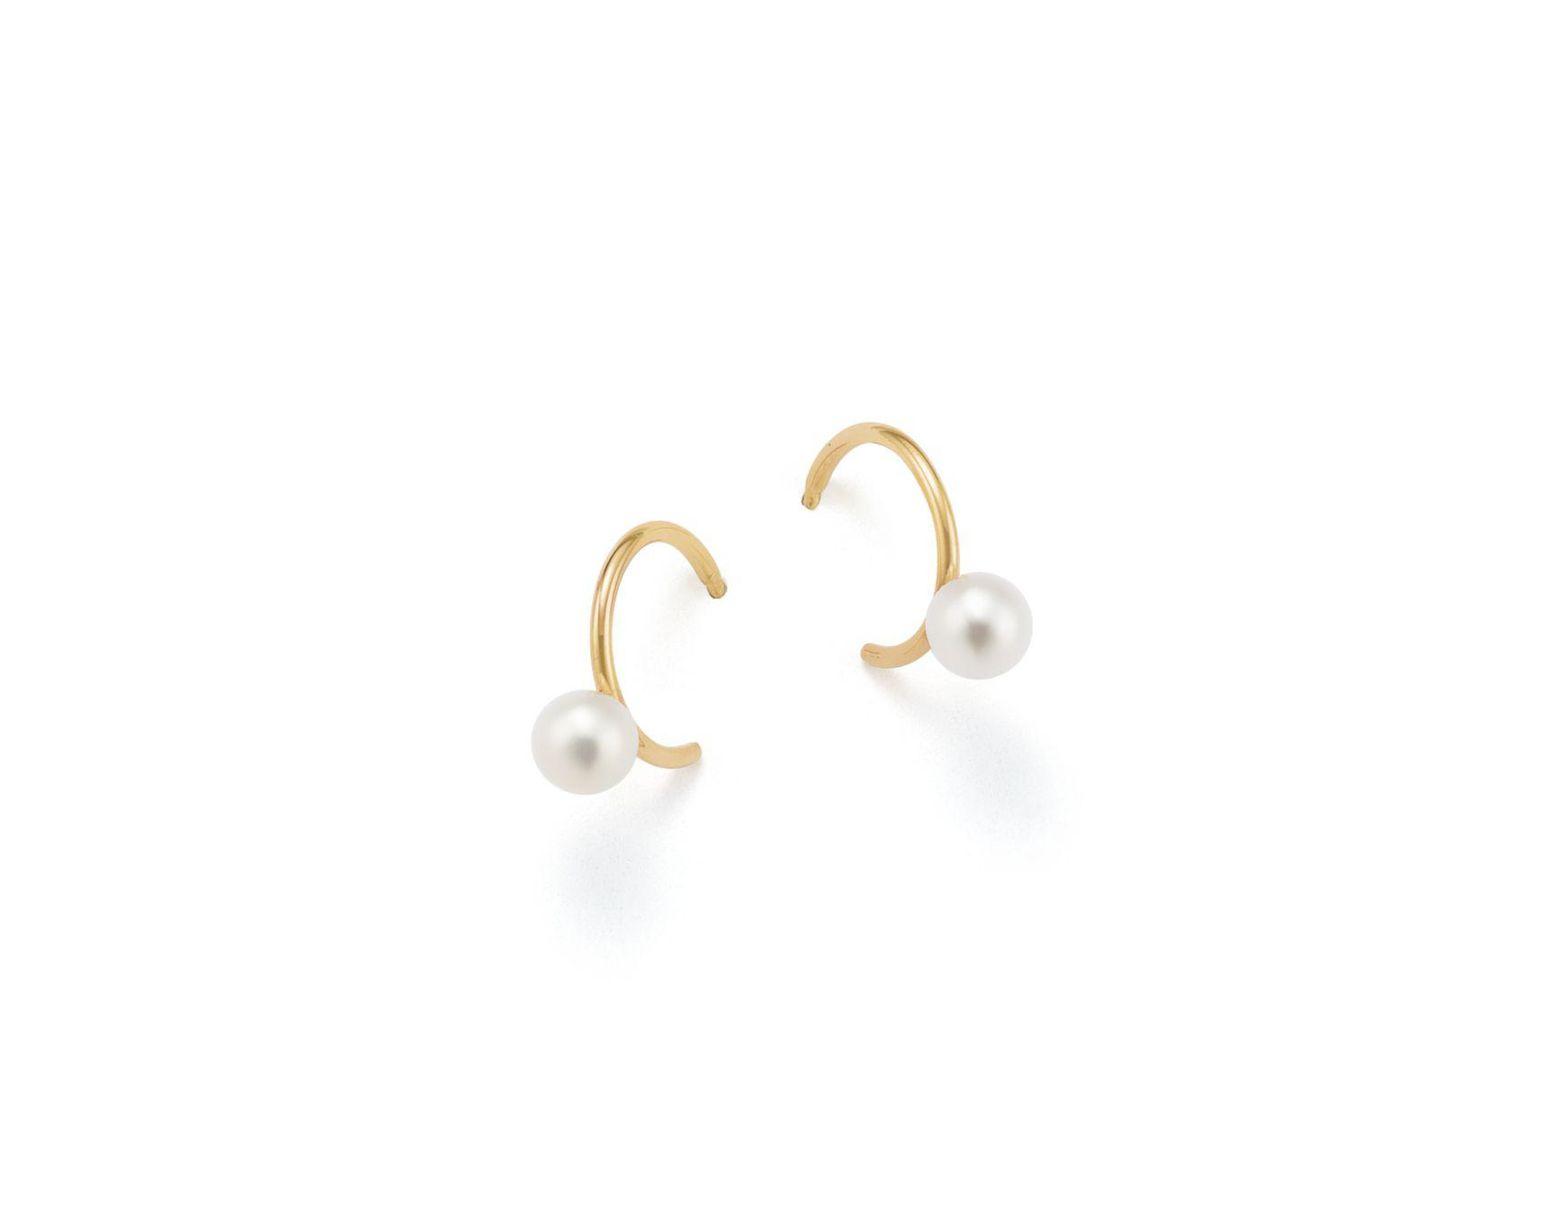 5563713e6 Zoe Chicco 14k Yellow Gold   Cultured Freshwater Pearl Huggie Hoop Earrings  in Metallic - Lyst